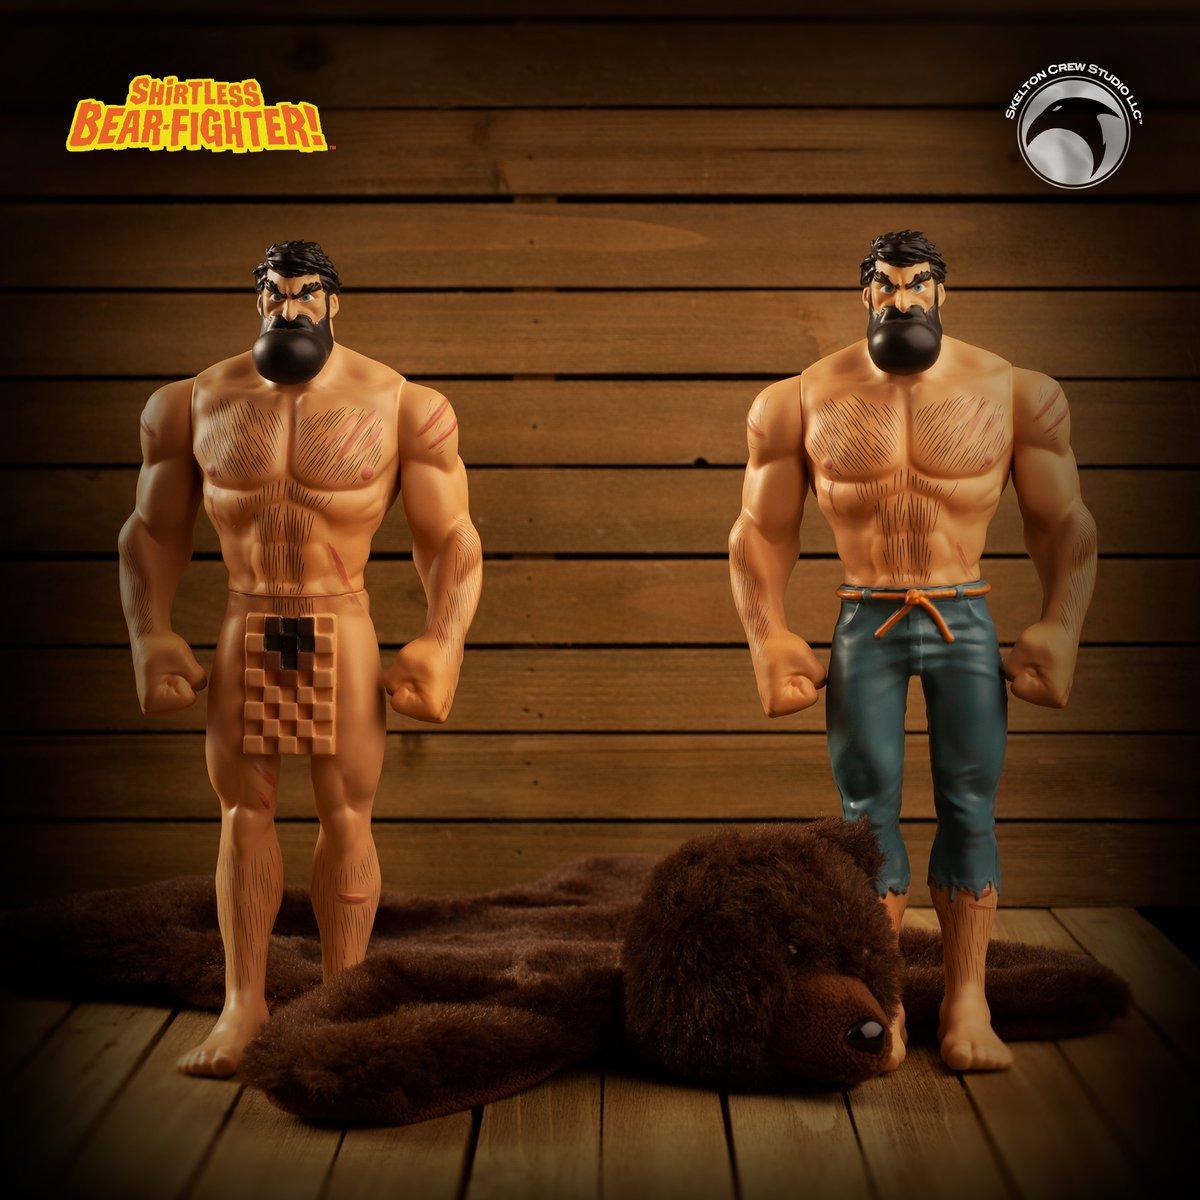 Skelton Crew Studio Shirtless Bear Fighter Limited